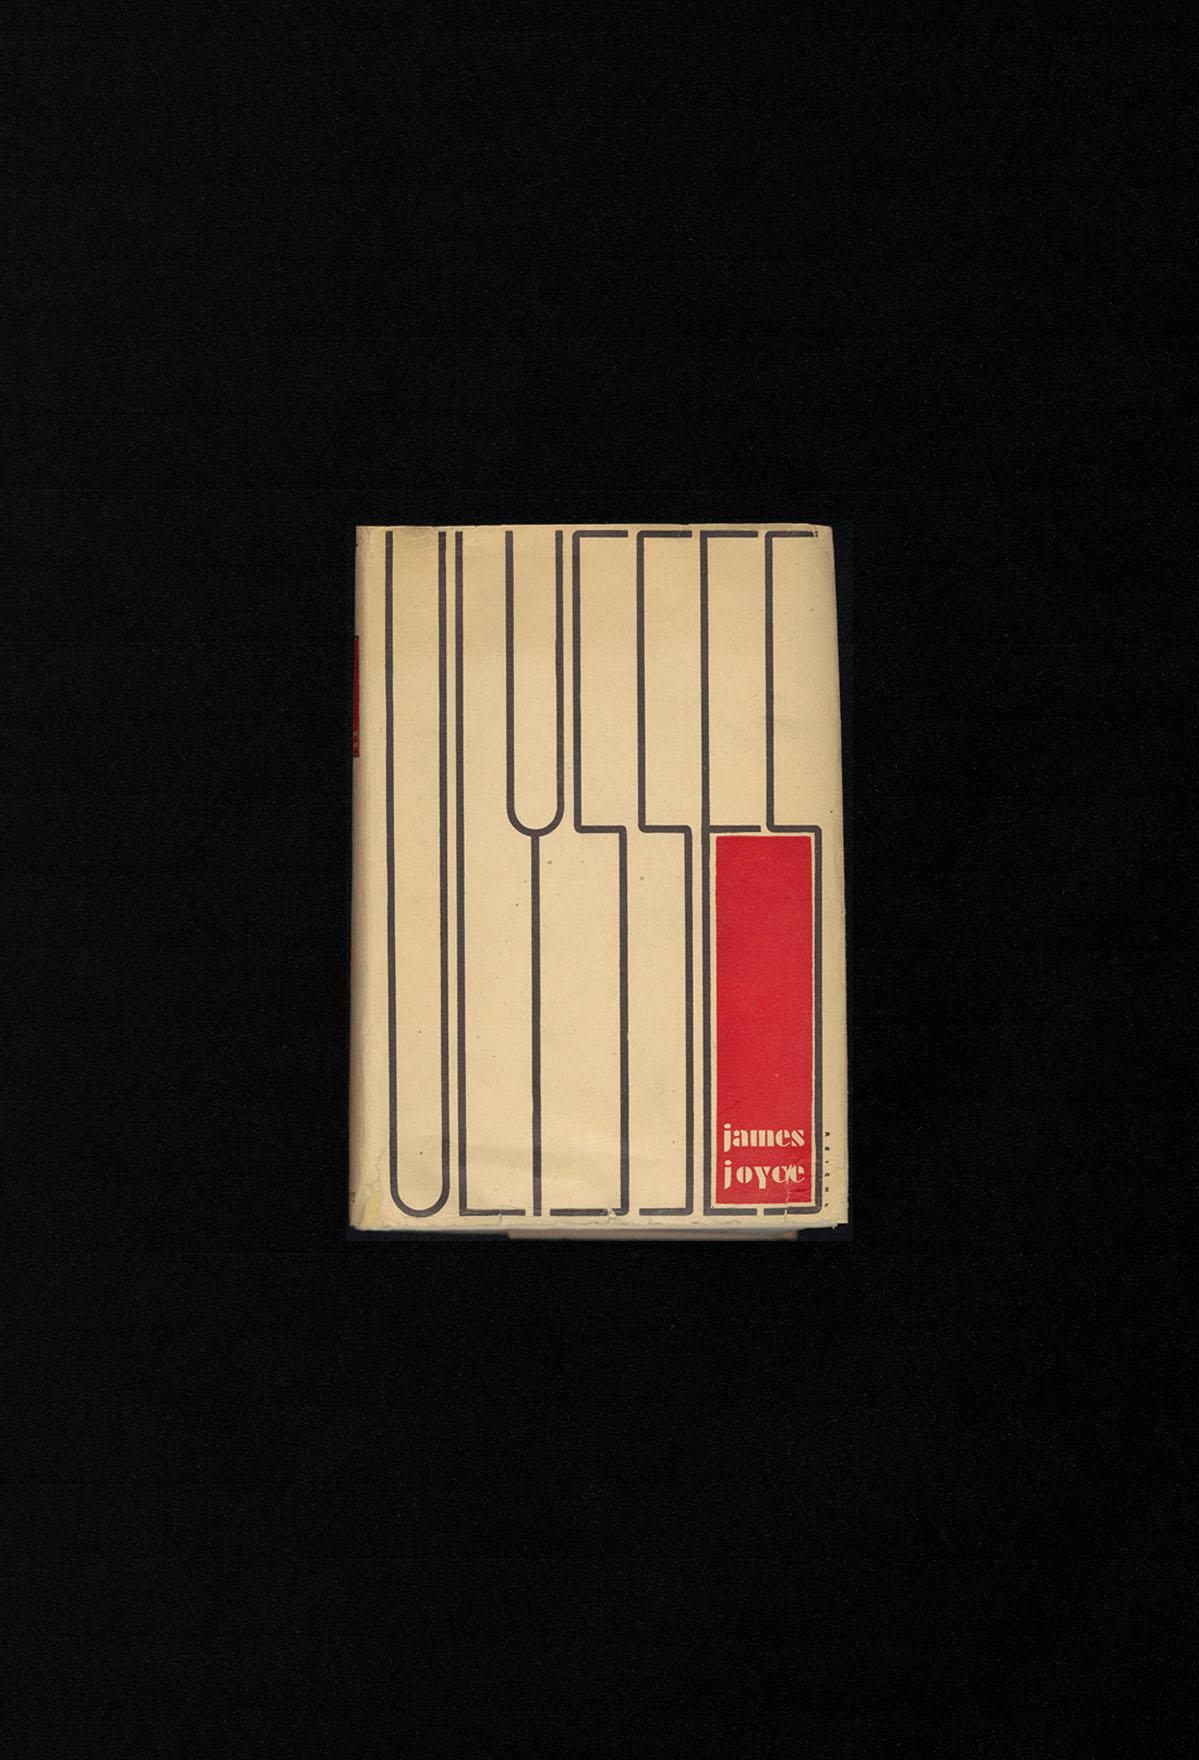 Novel by Design: Ernst Reichl's Take on Joyce's Ulysses